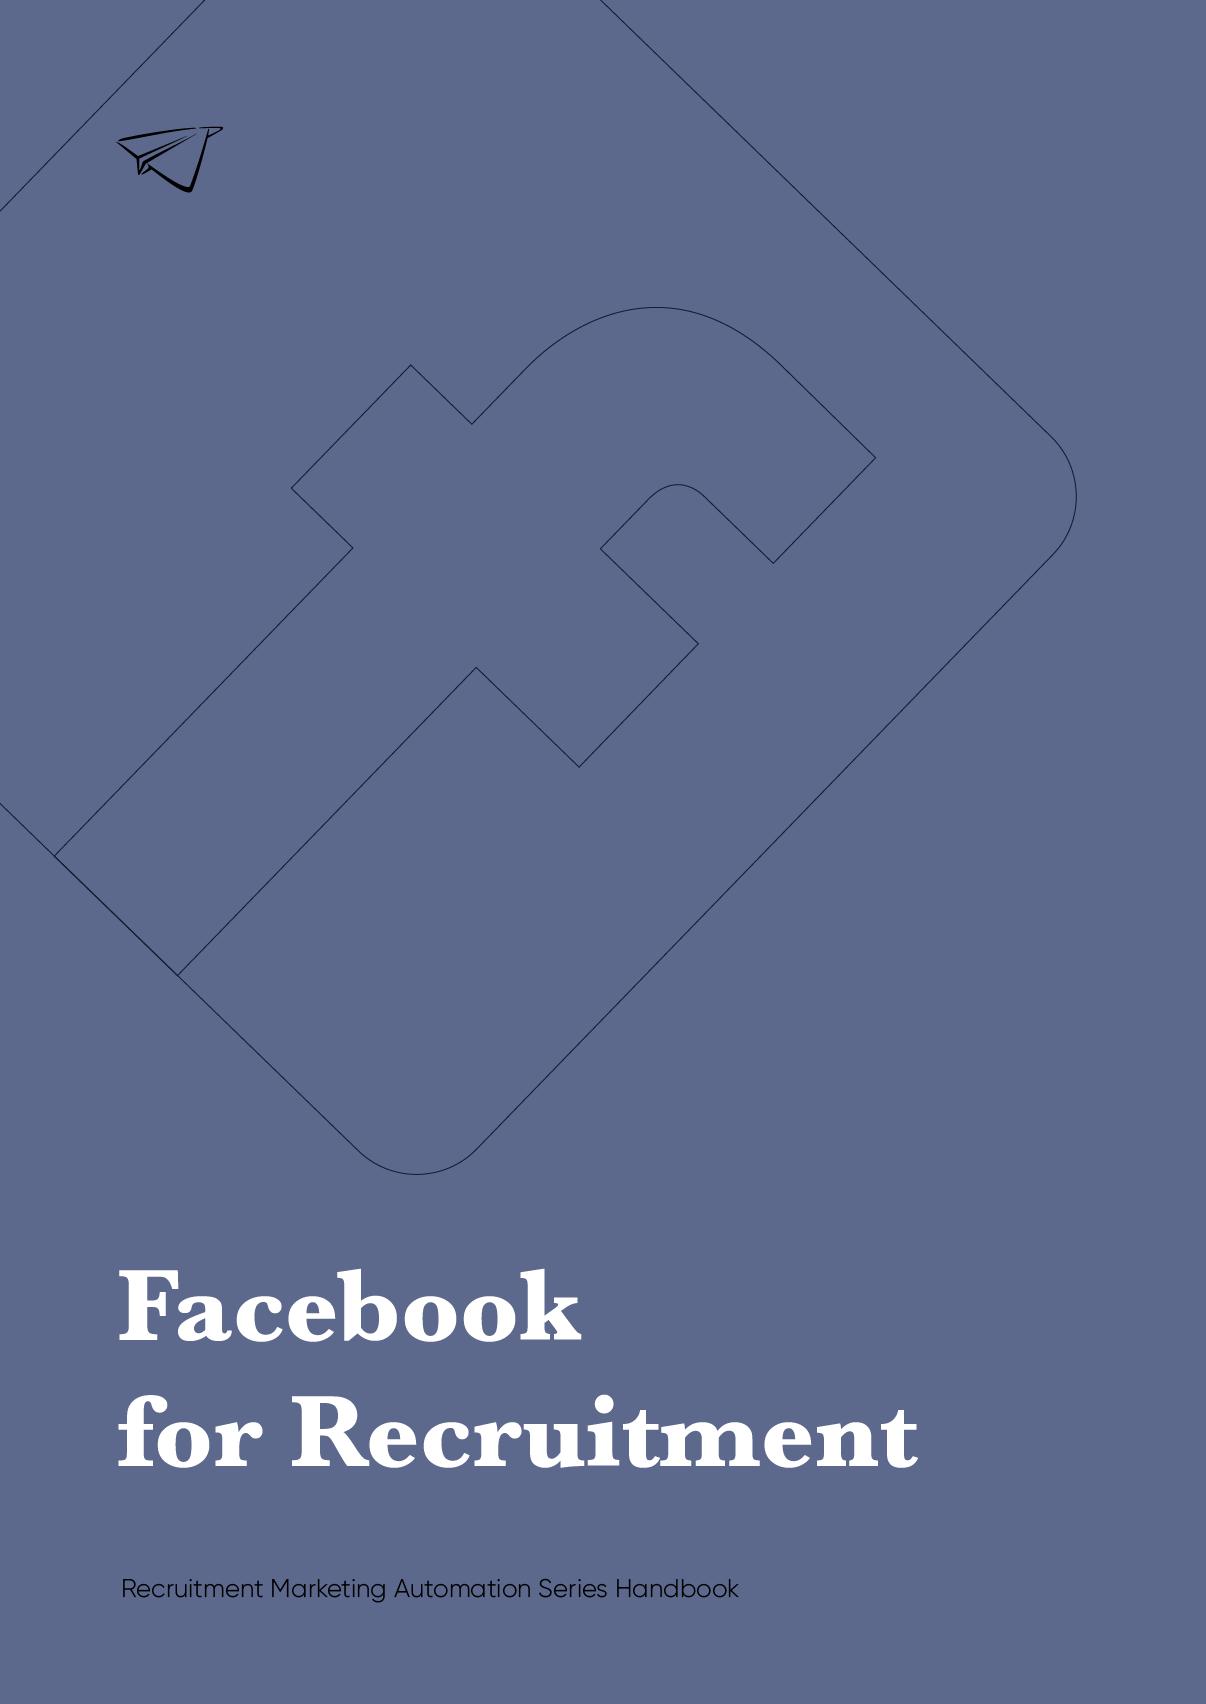 Facebook for Recruitment